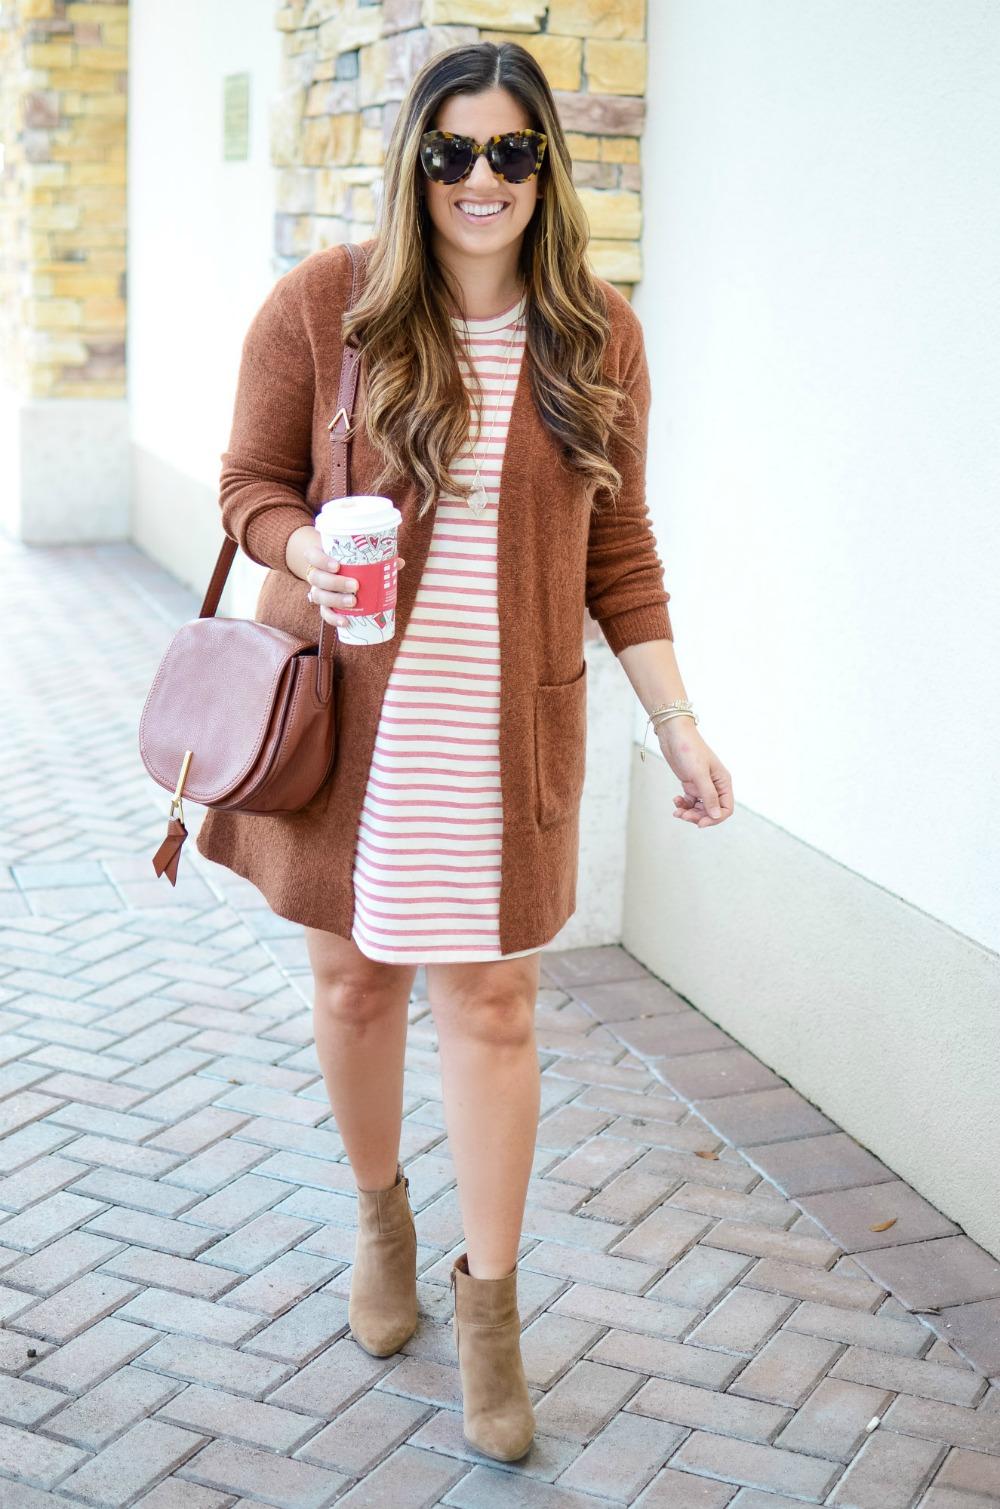 cognac cardigan, striped t-shirt dress, taupe booties